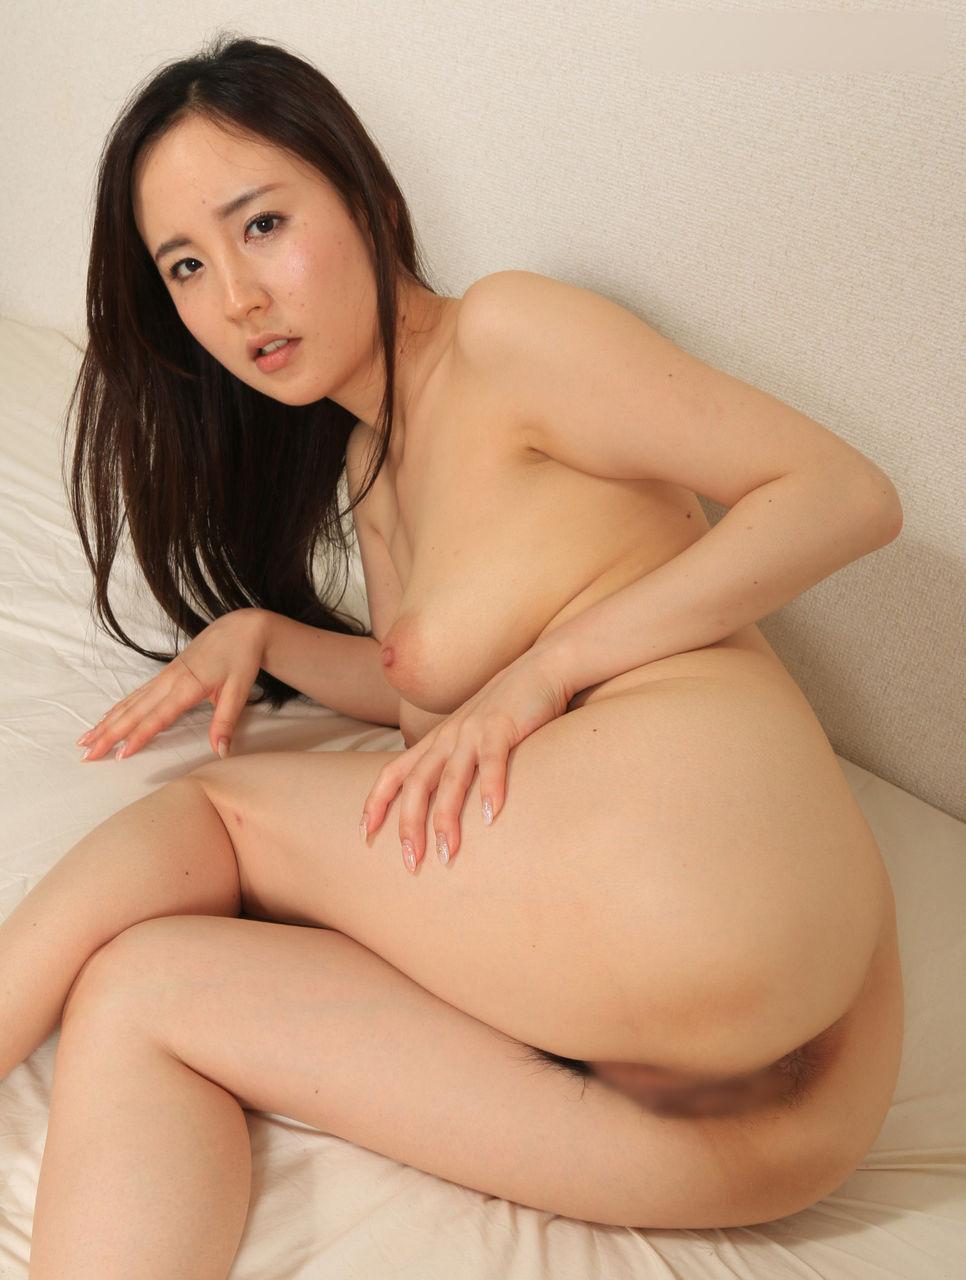 Pacific Girls 鮮明オマンコ en.pic4.work